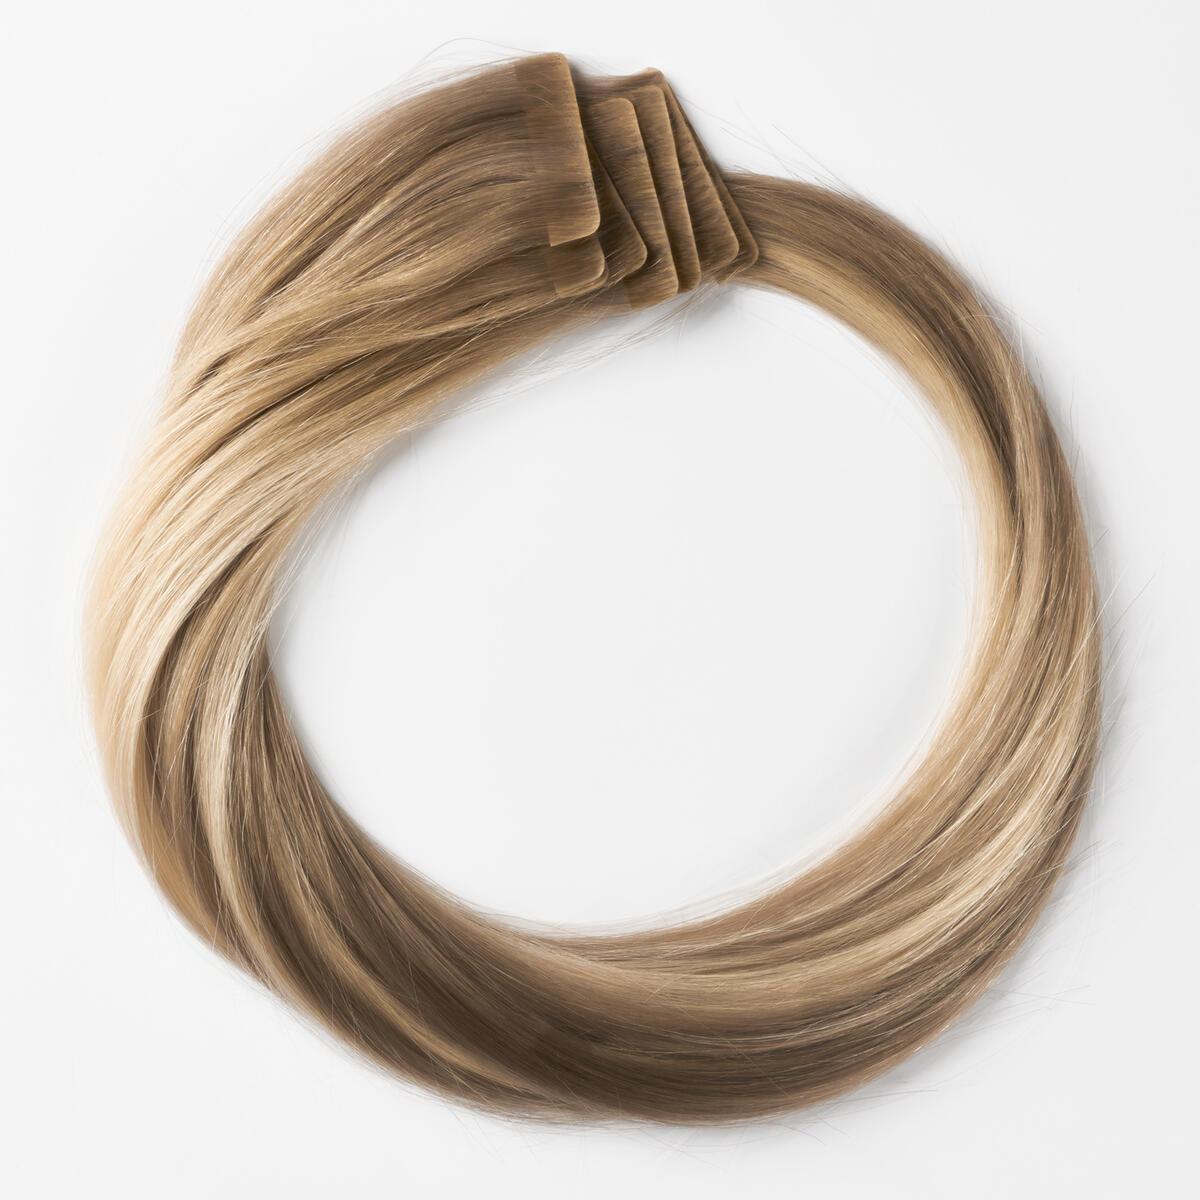 Pro Tape Extension B2.6/10.7 Dark Ashy Blonde Balayage 50 cm